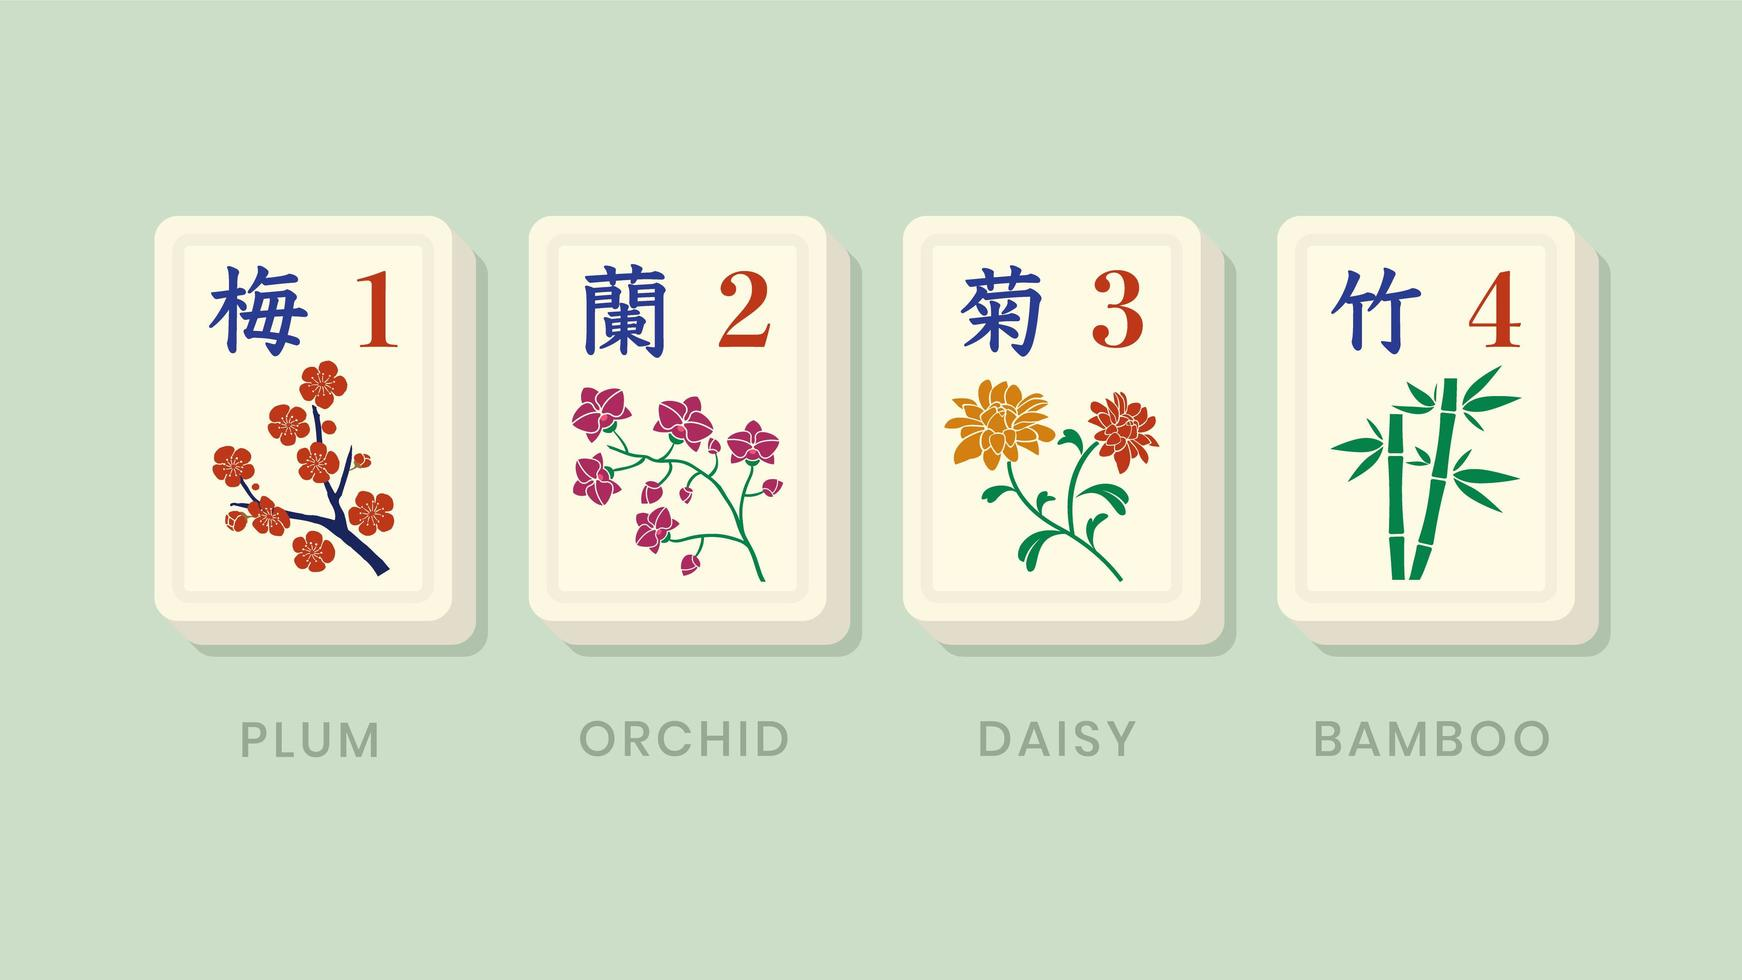 fichas de flores de bonificación de Mahjong vector